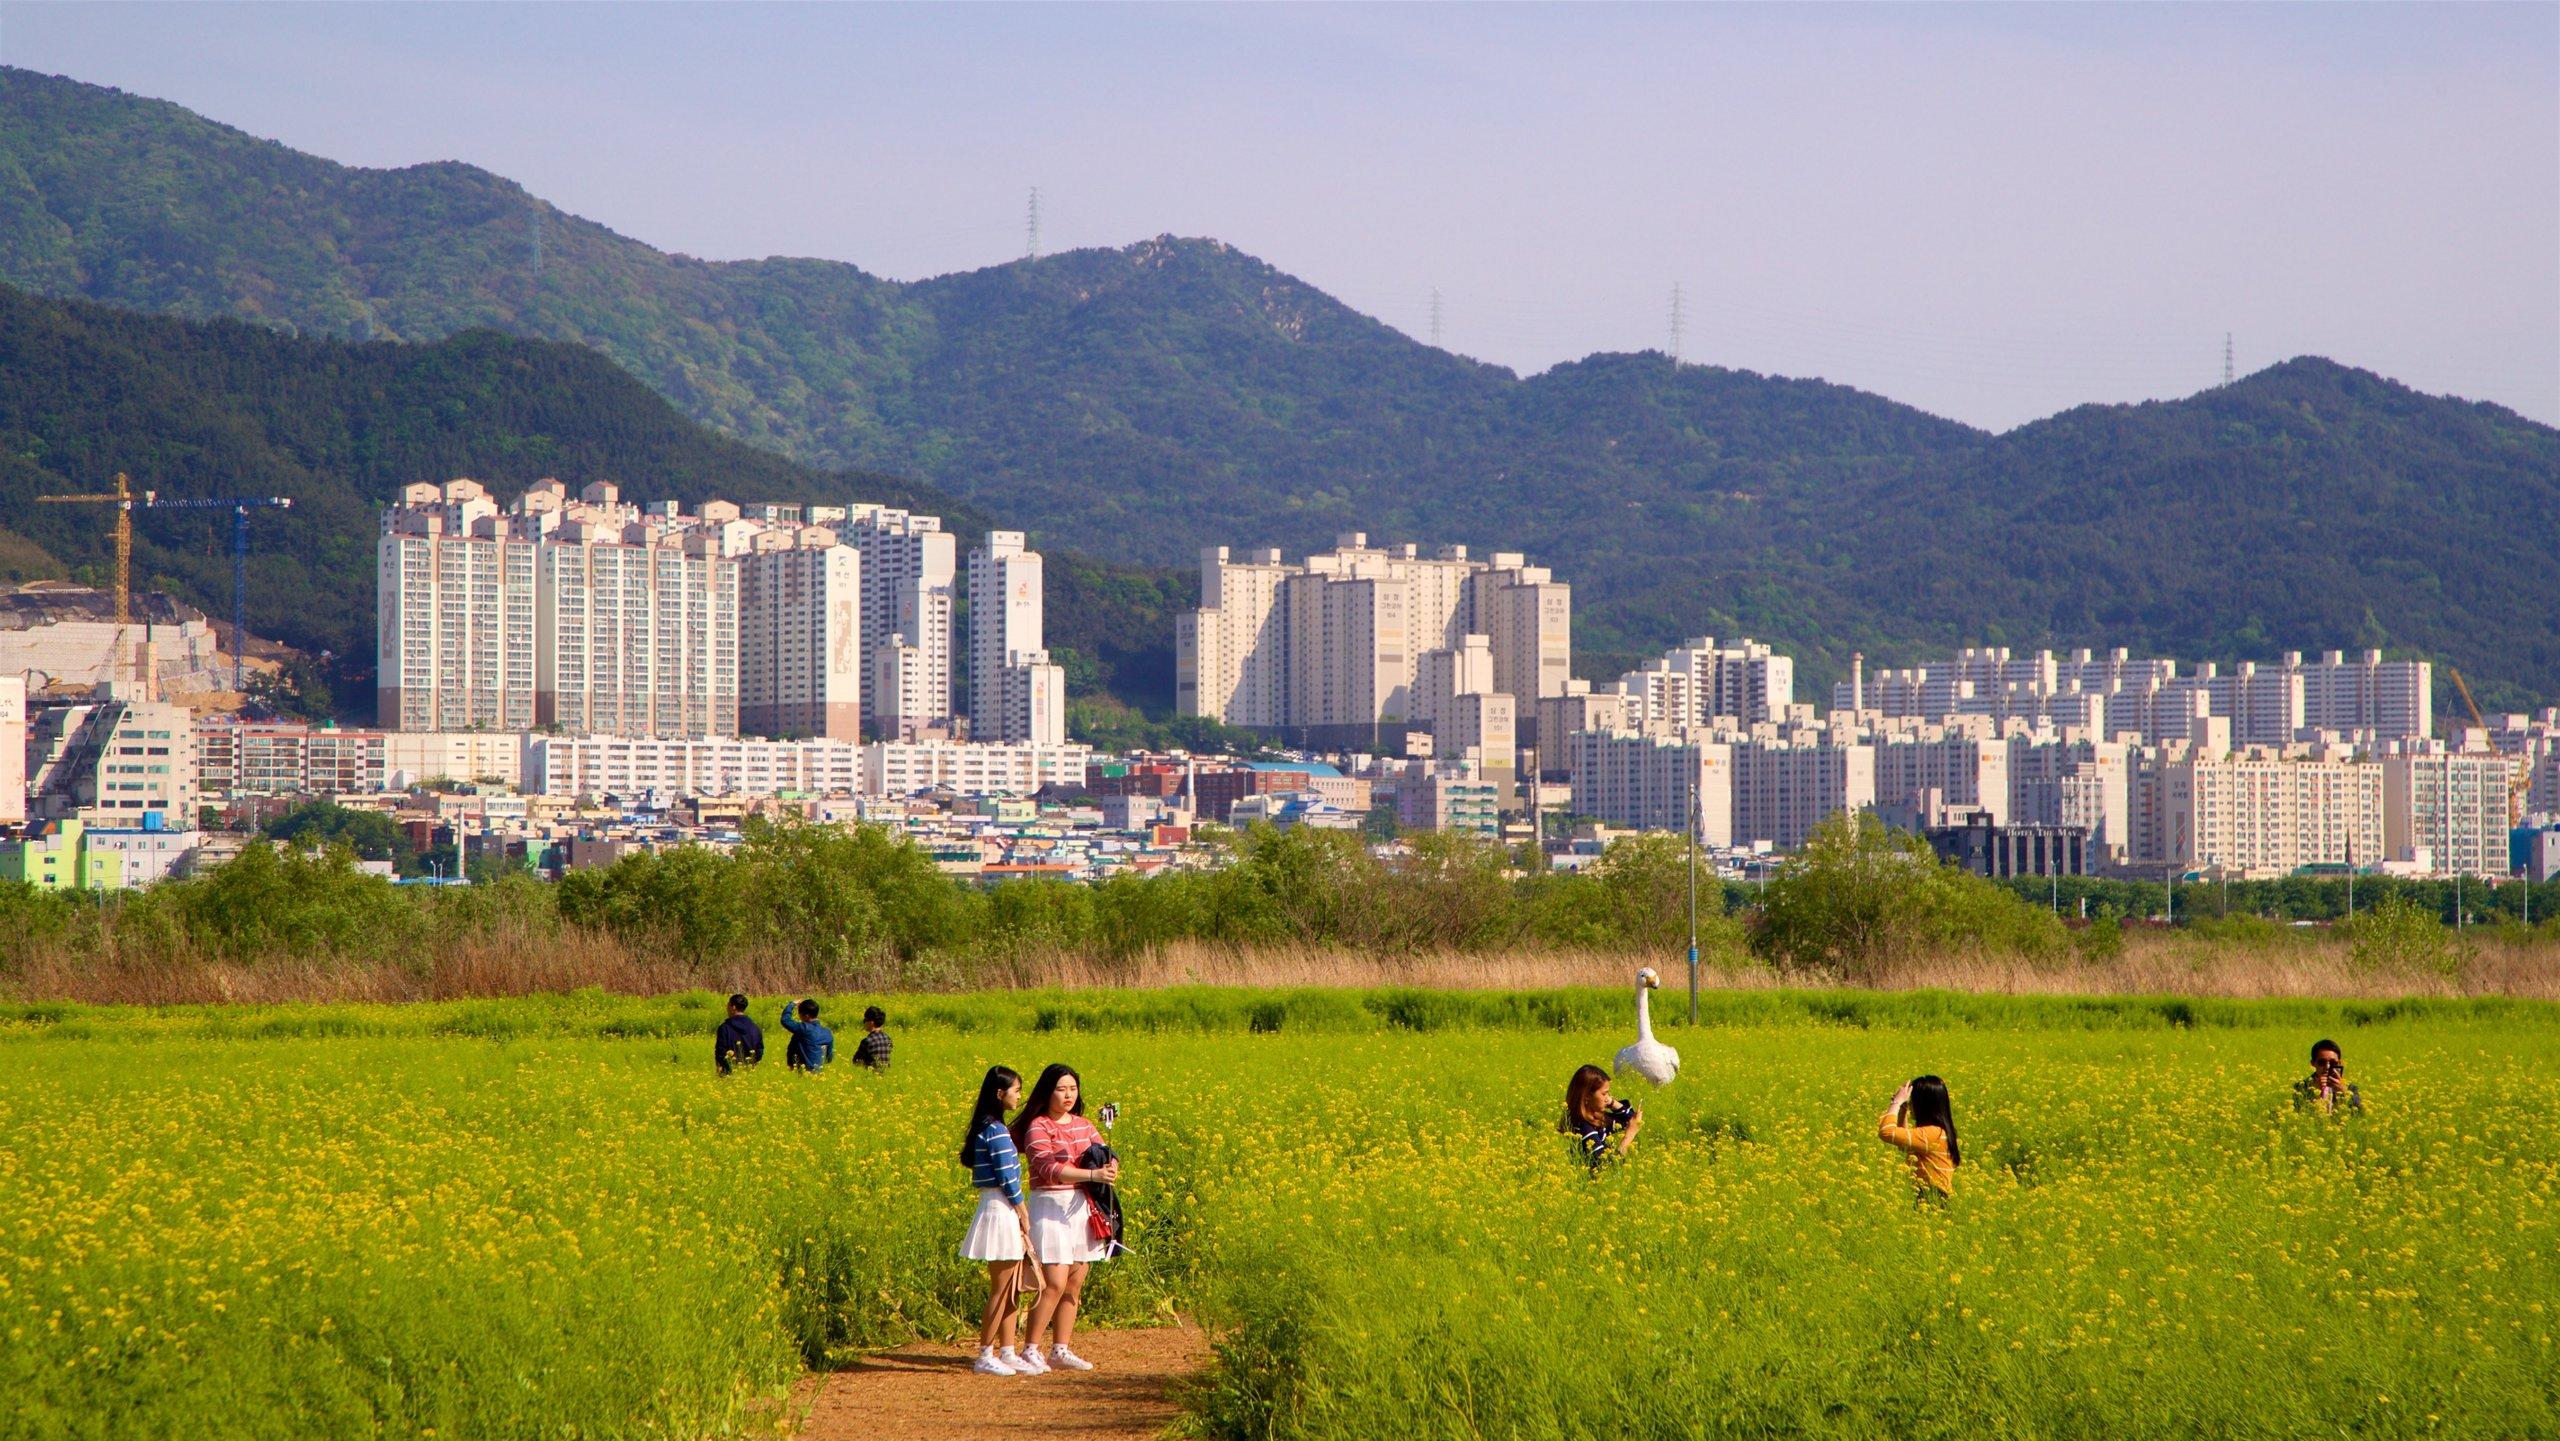 Gangseo District, Busan, South Korea